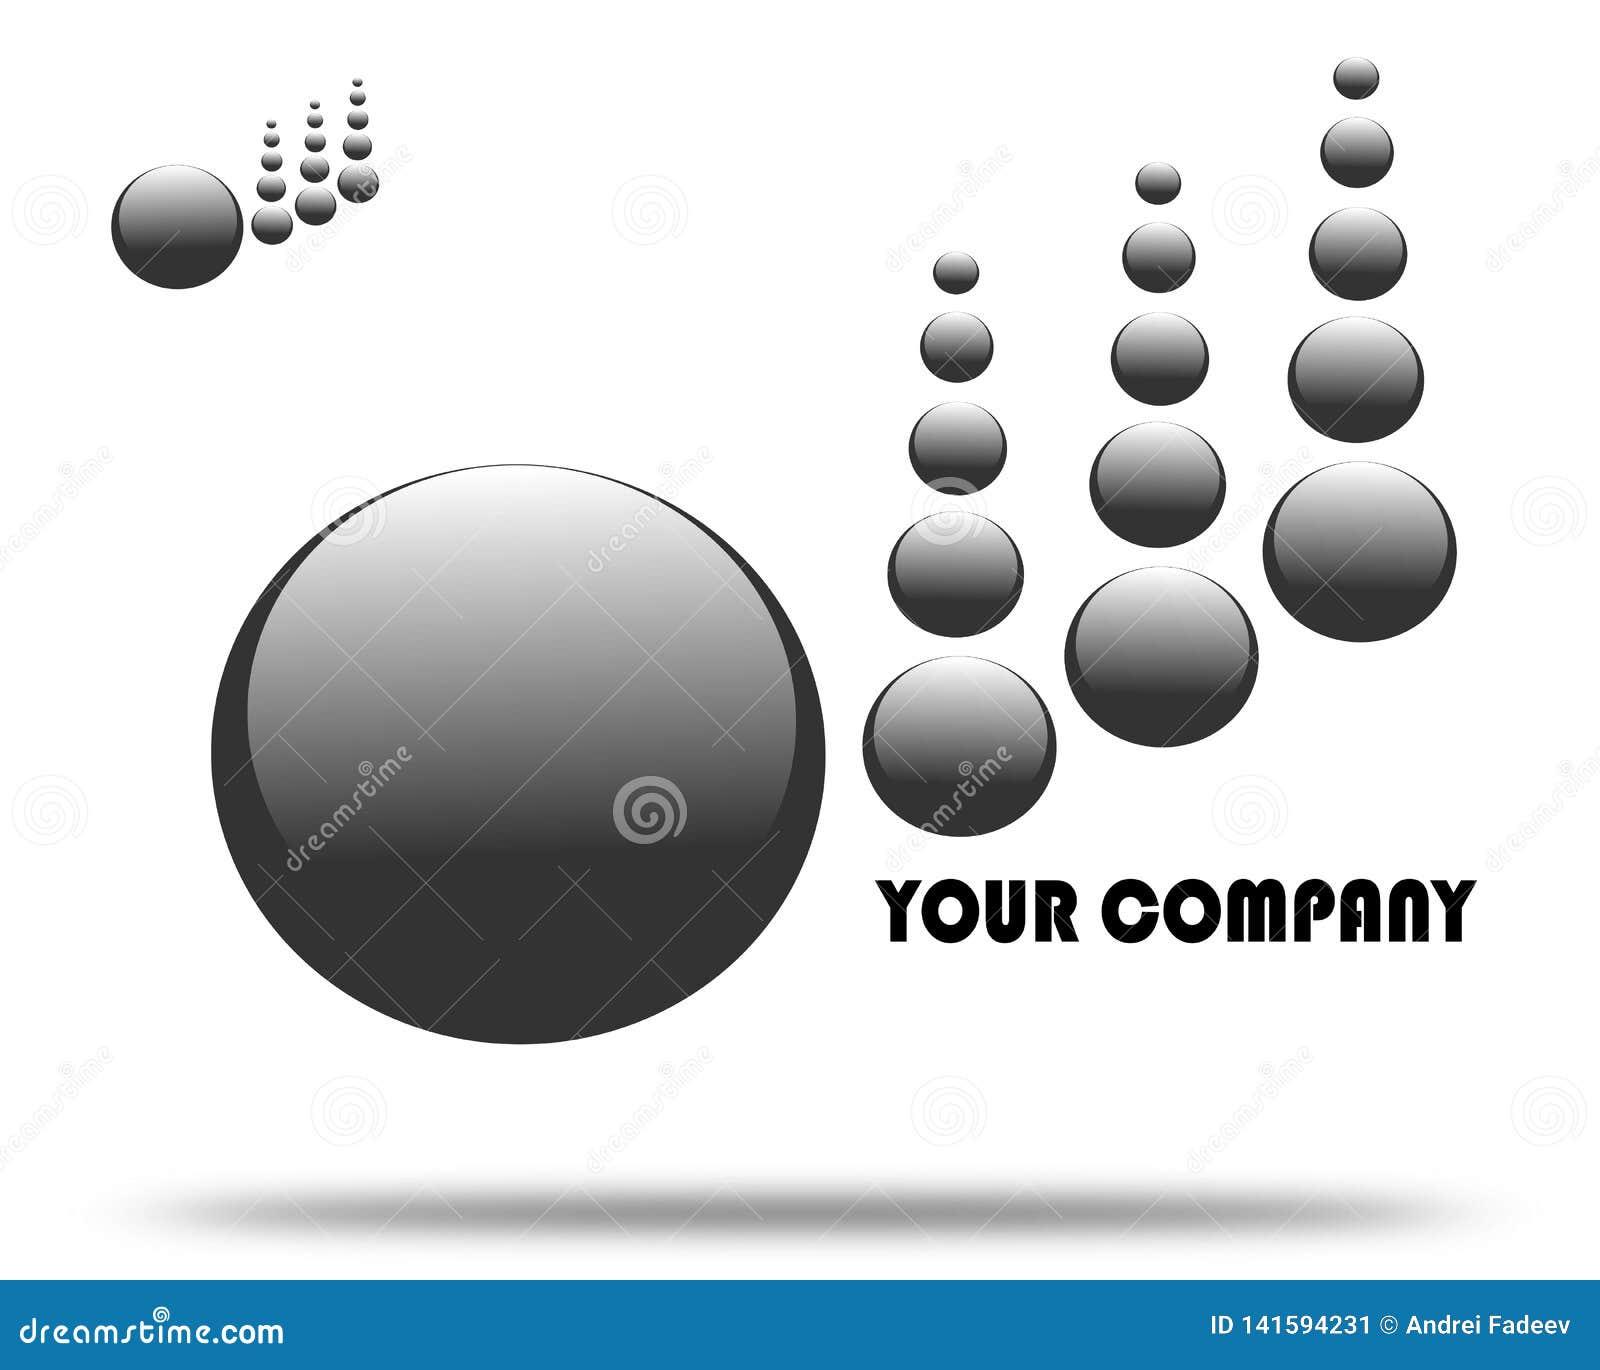 Drawing company logo black drop.